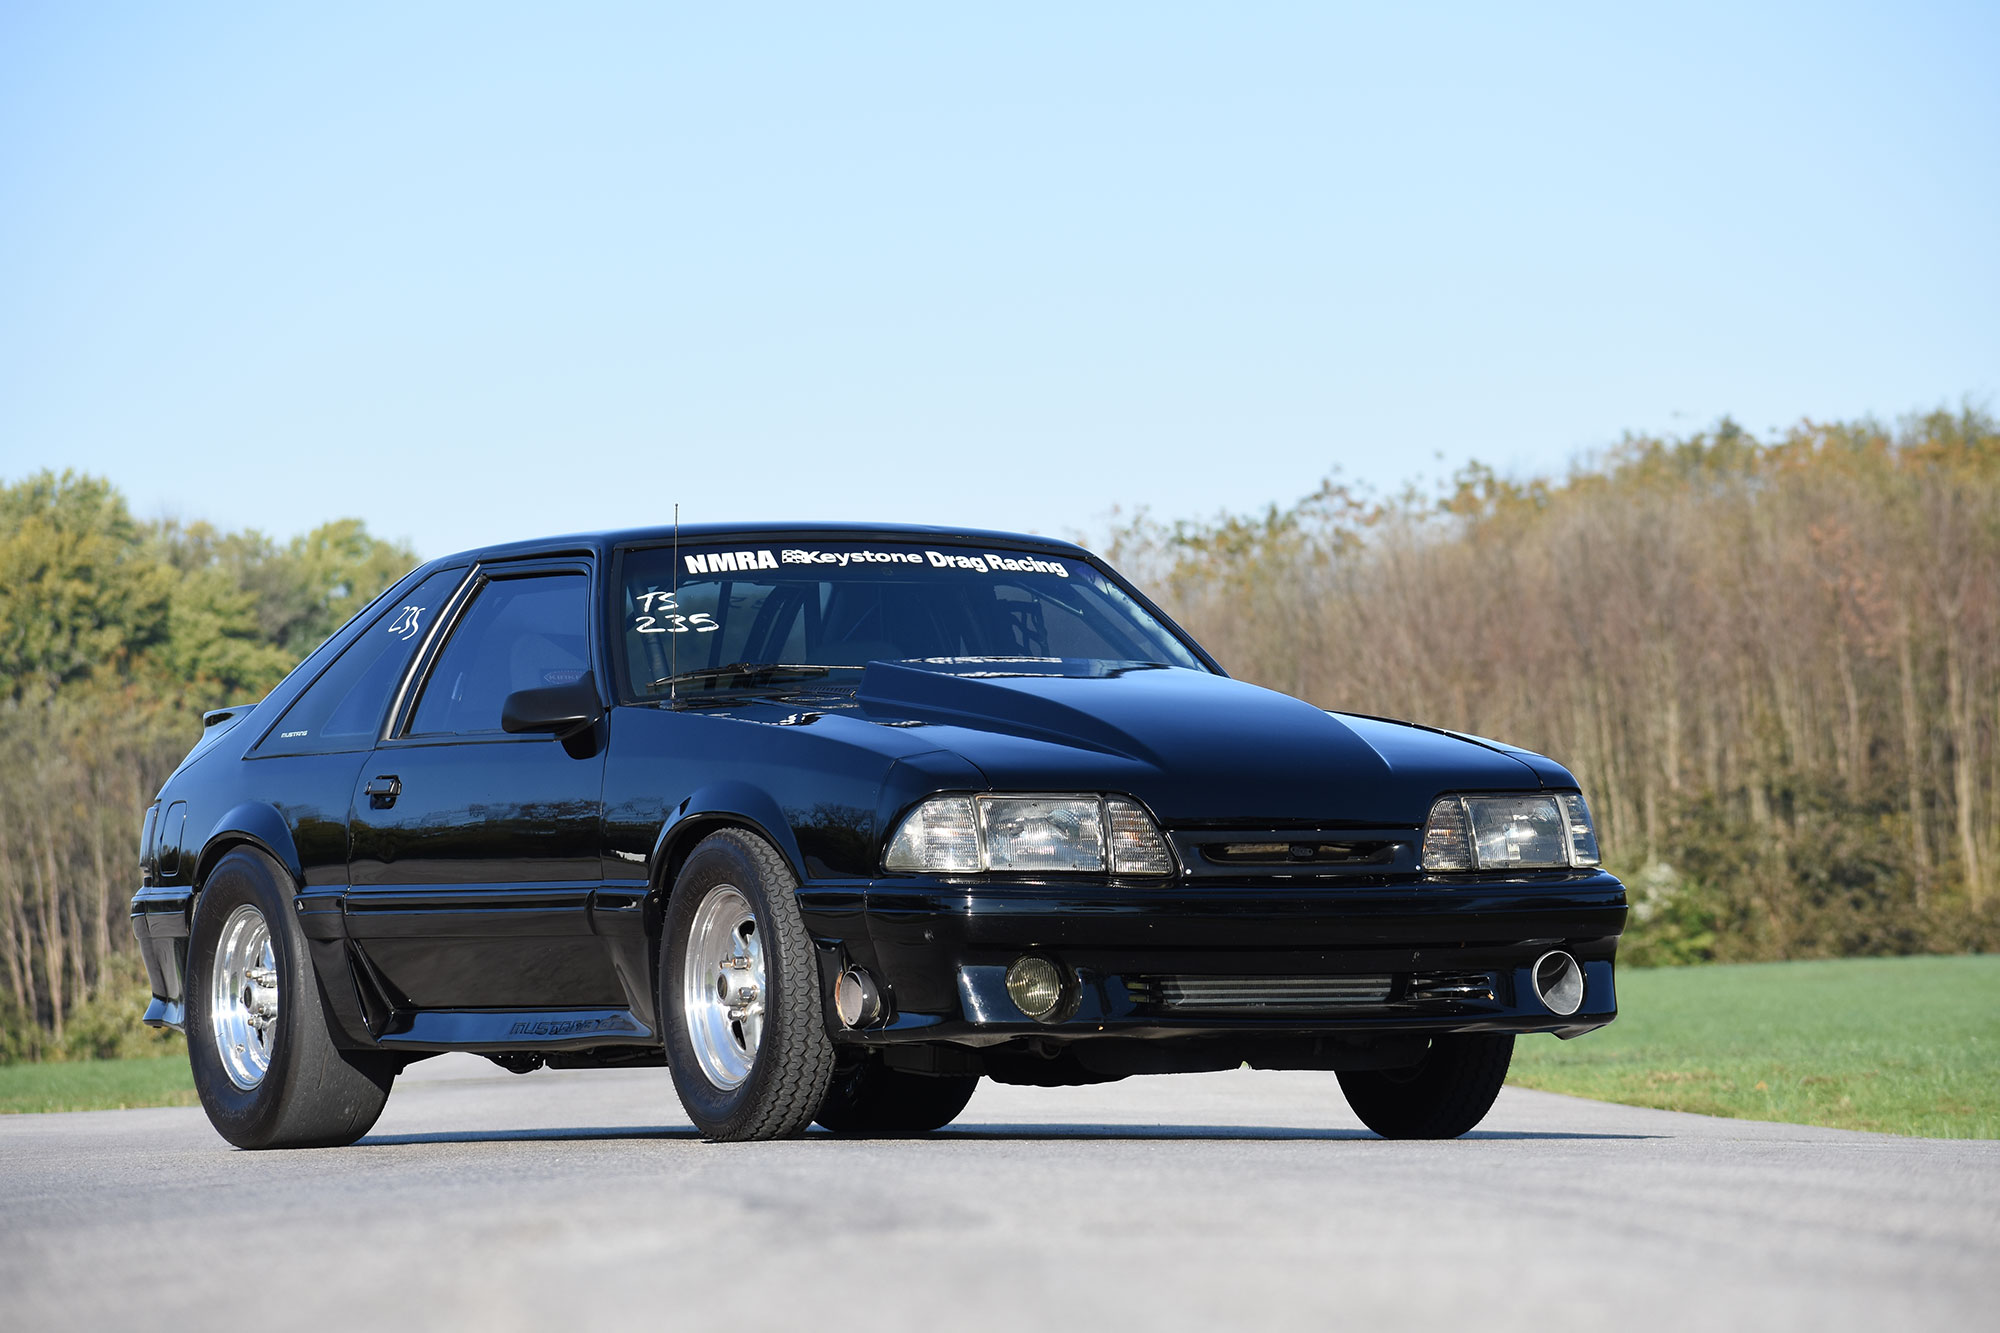 1988 Fox-body Mustang race car front